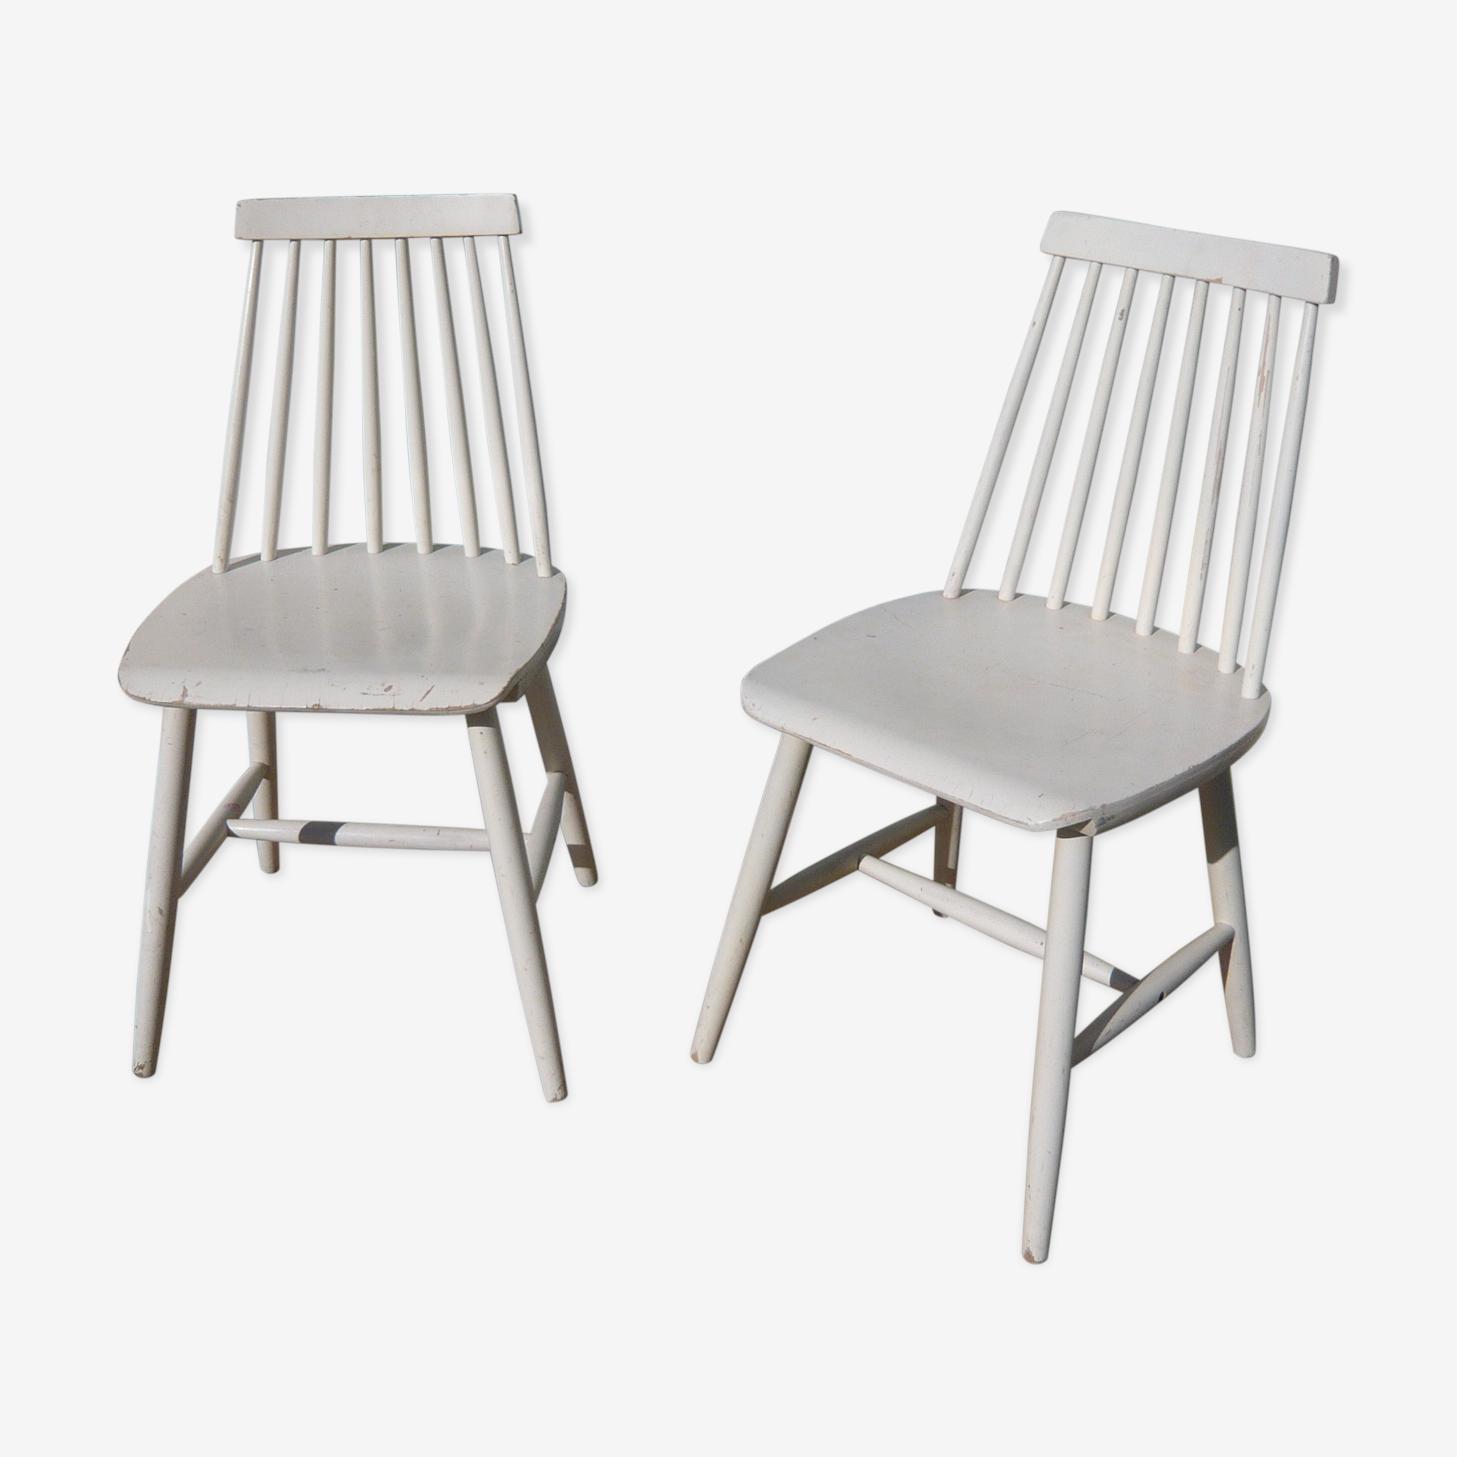 Scandinavian chairs